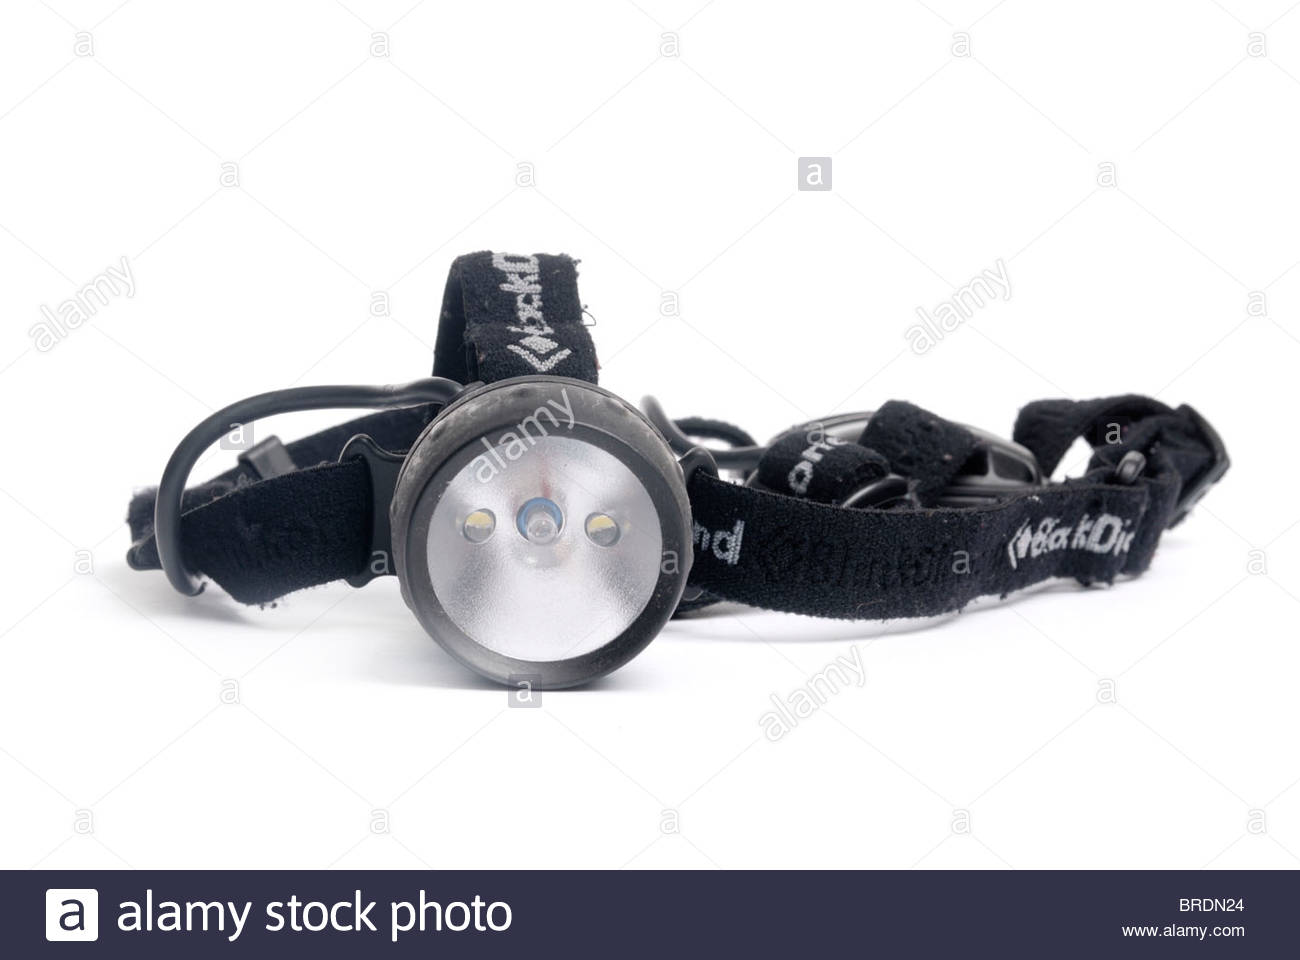 Headlamp - Stock Image